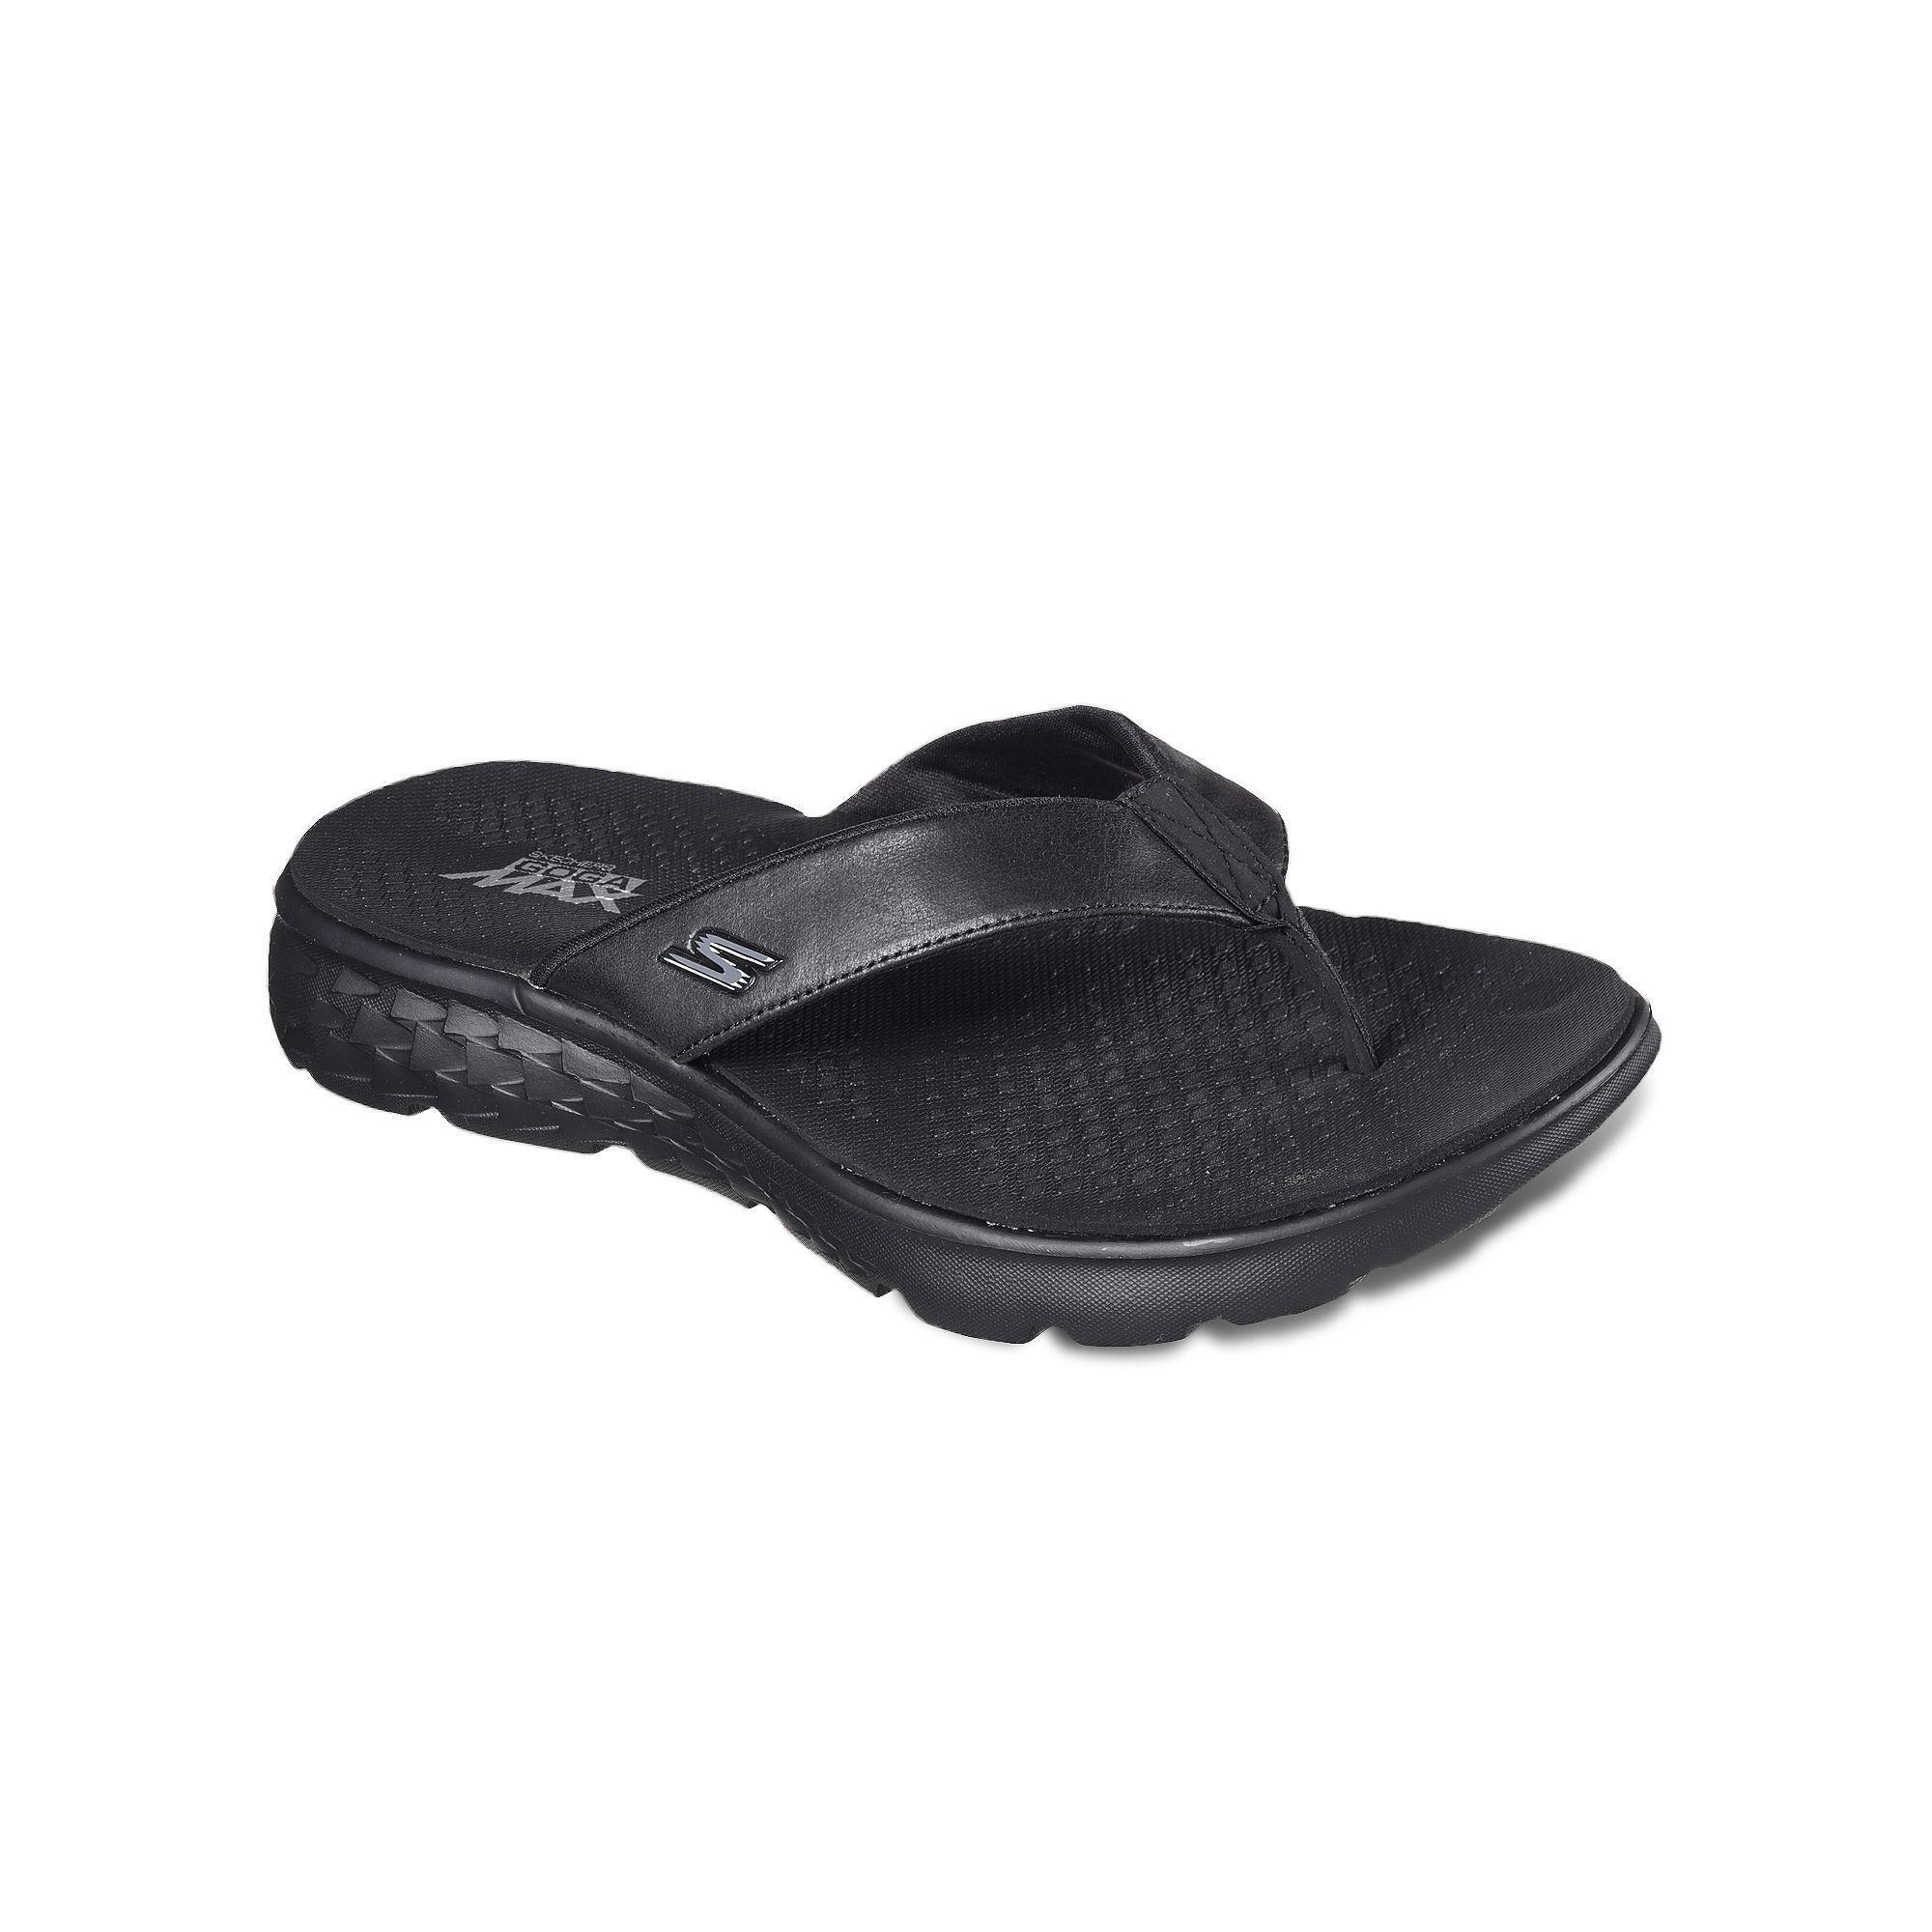 80a784361 Skechers On the Go 400 Vista Men s Sandals